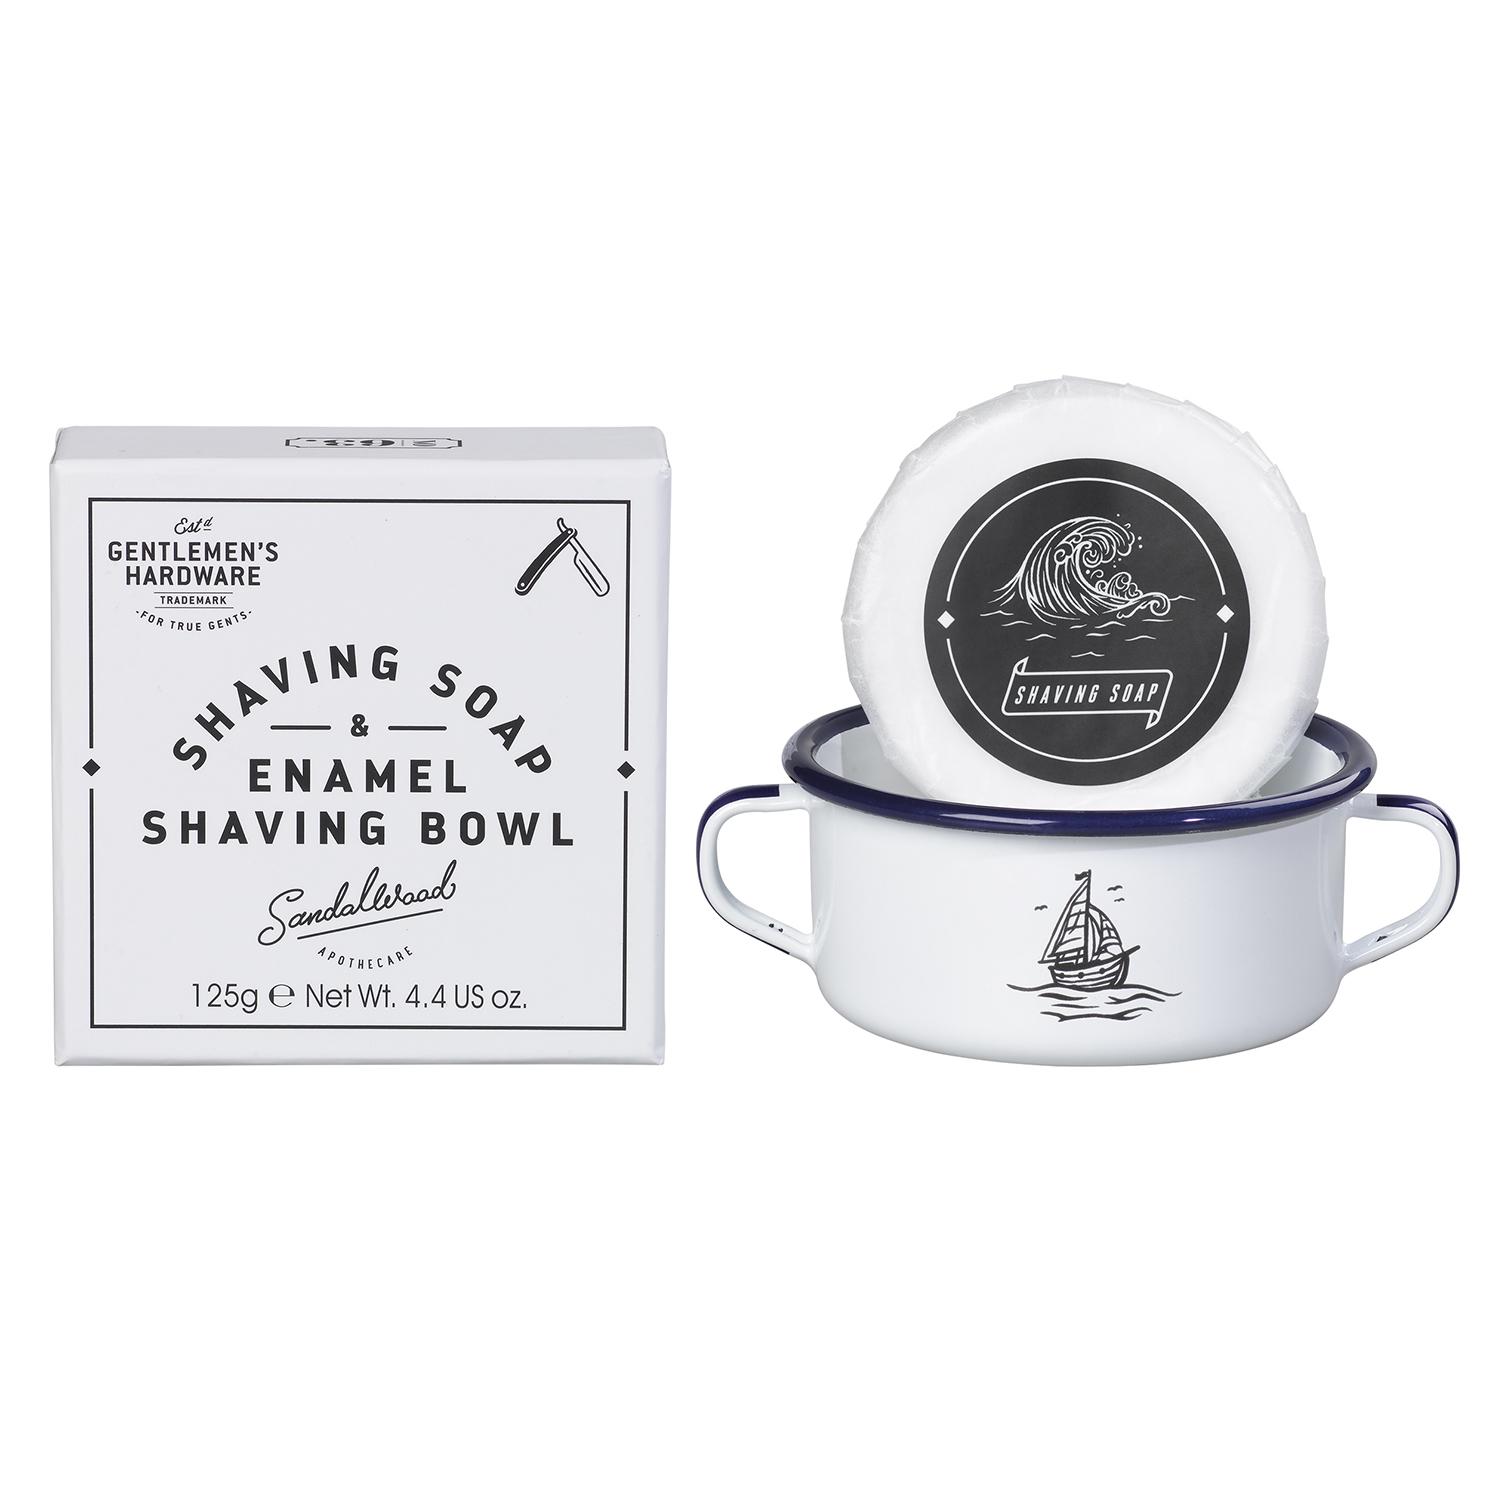 Gentlemen's Hardware – Shaving Soap & Enamel Shaving Bowl in Presentation Box